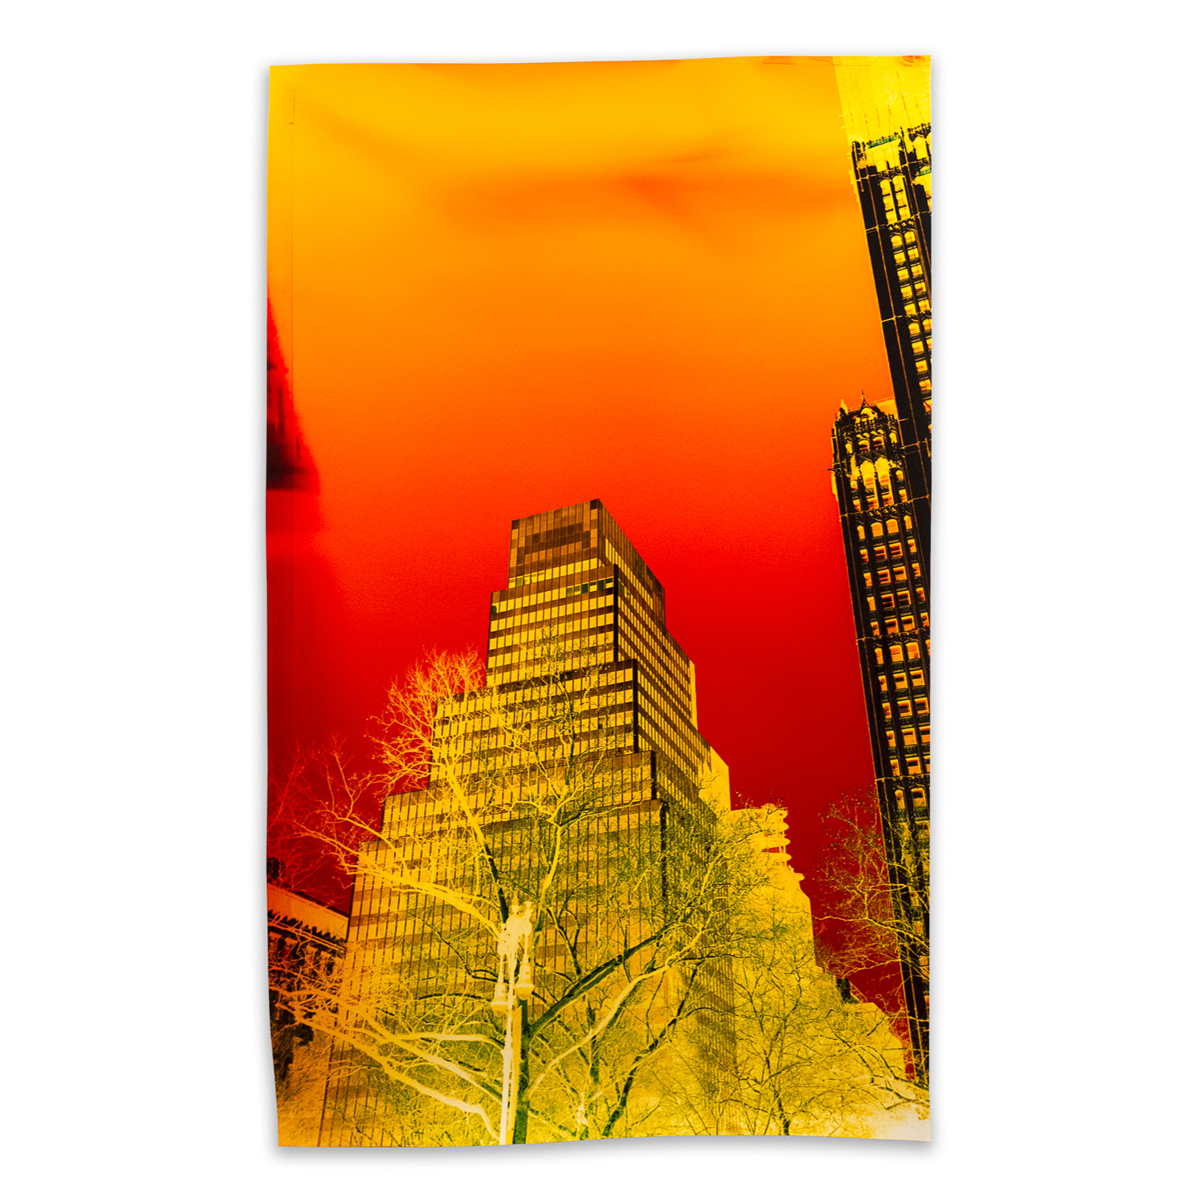 Image above: John Chiara, Park Row at Frankfort Street, 2016, Negative Chromogenic Photograph, Unique, © John Chiara, Courtesy Yossi Milo Gallery, New York